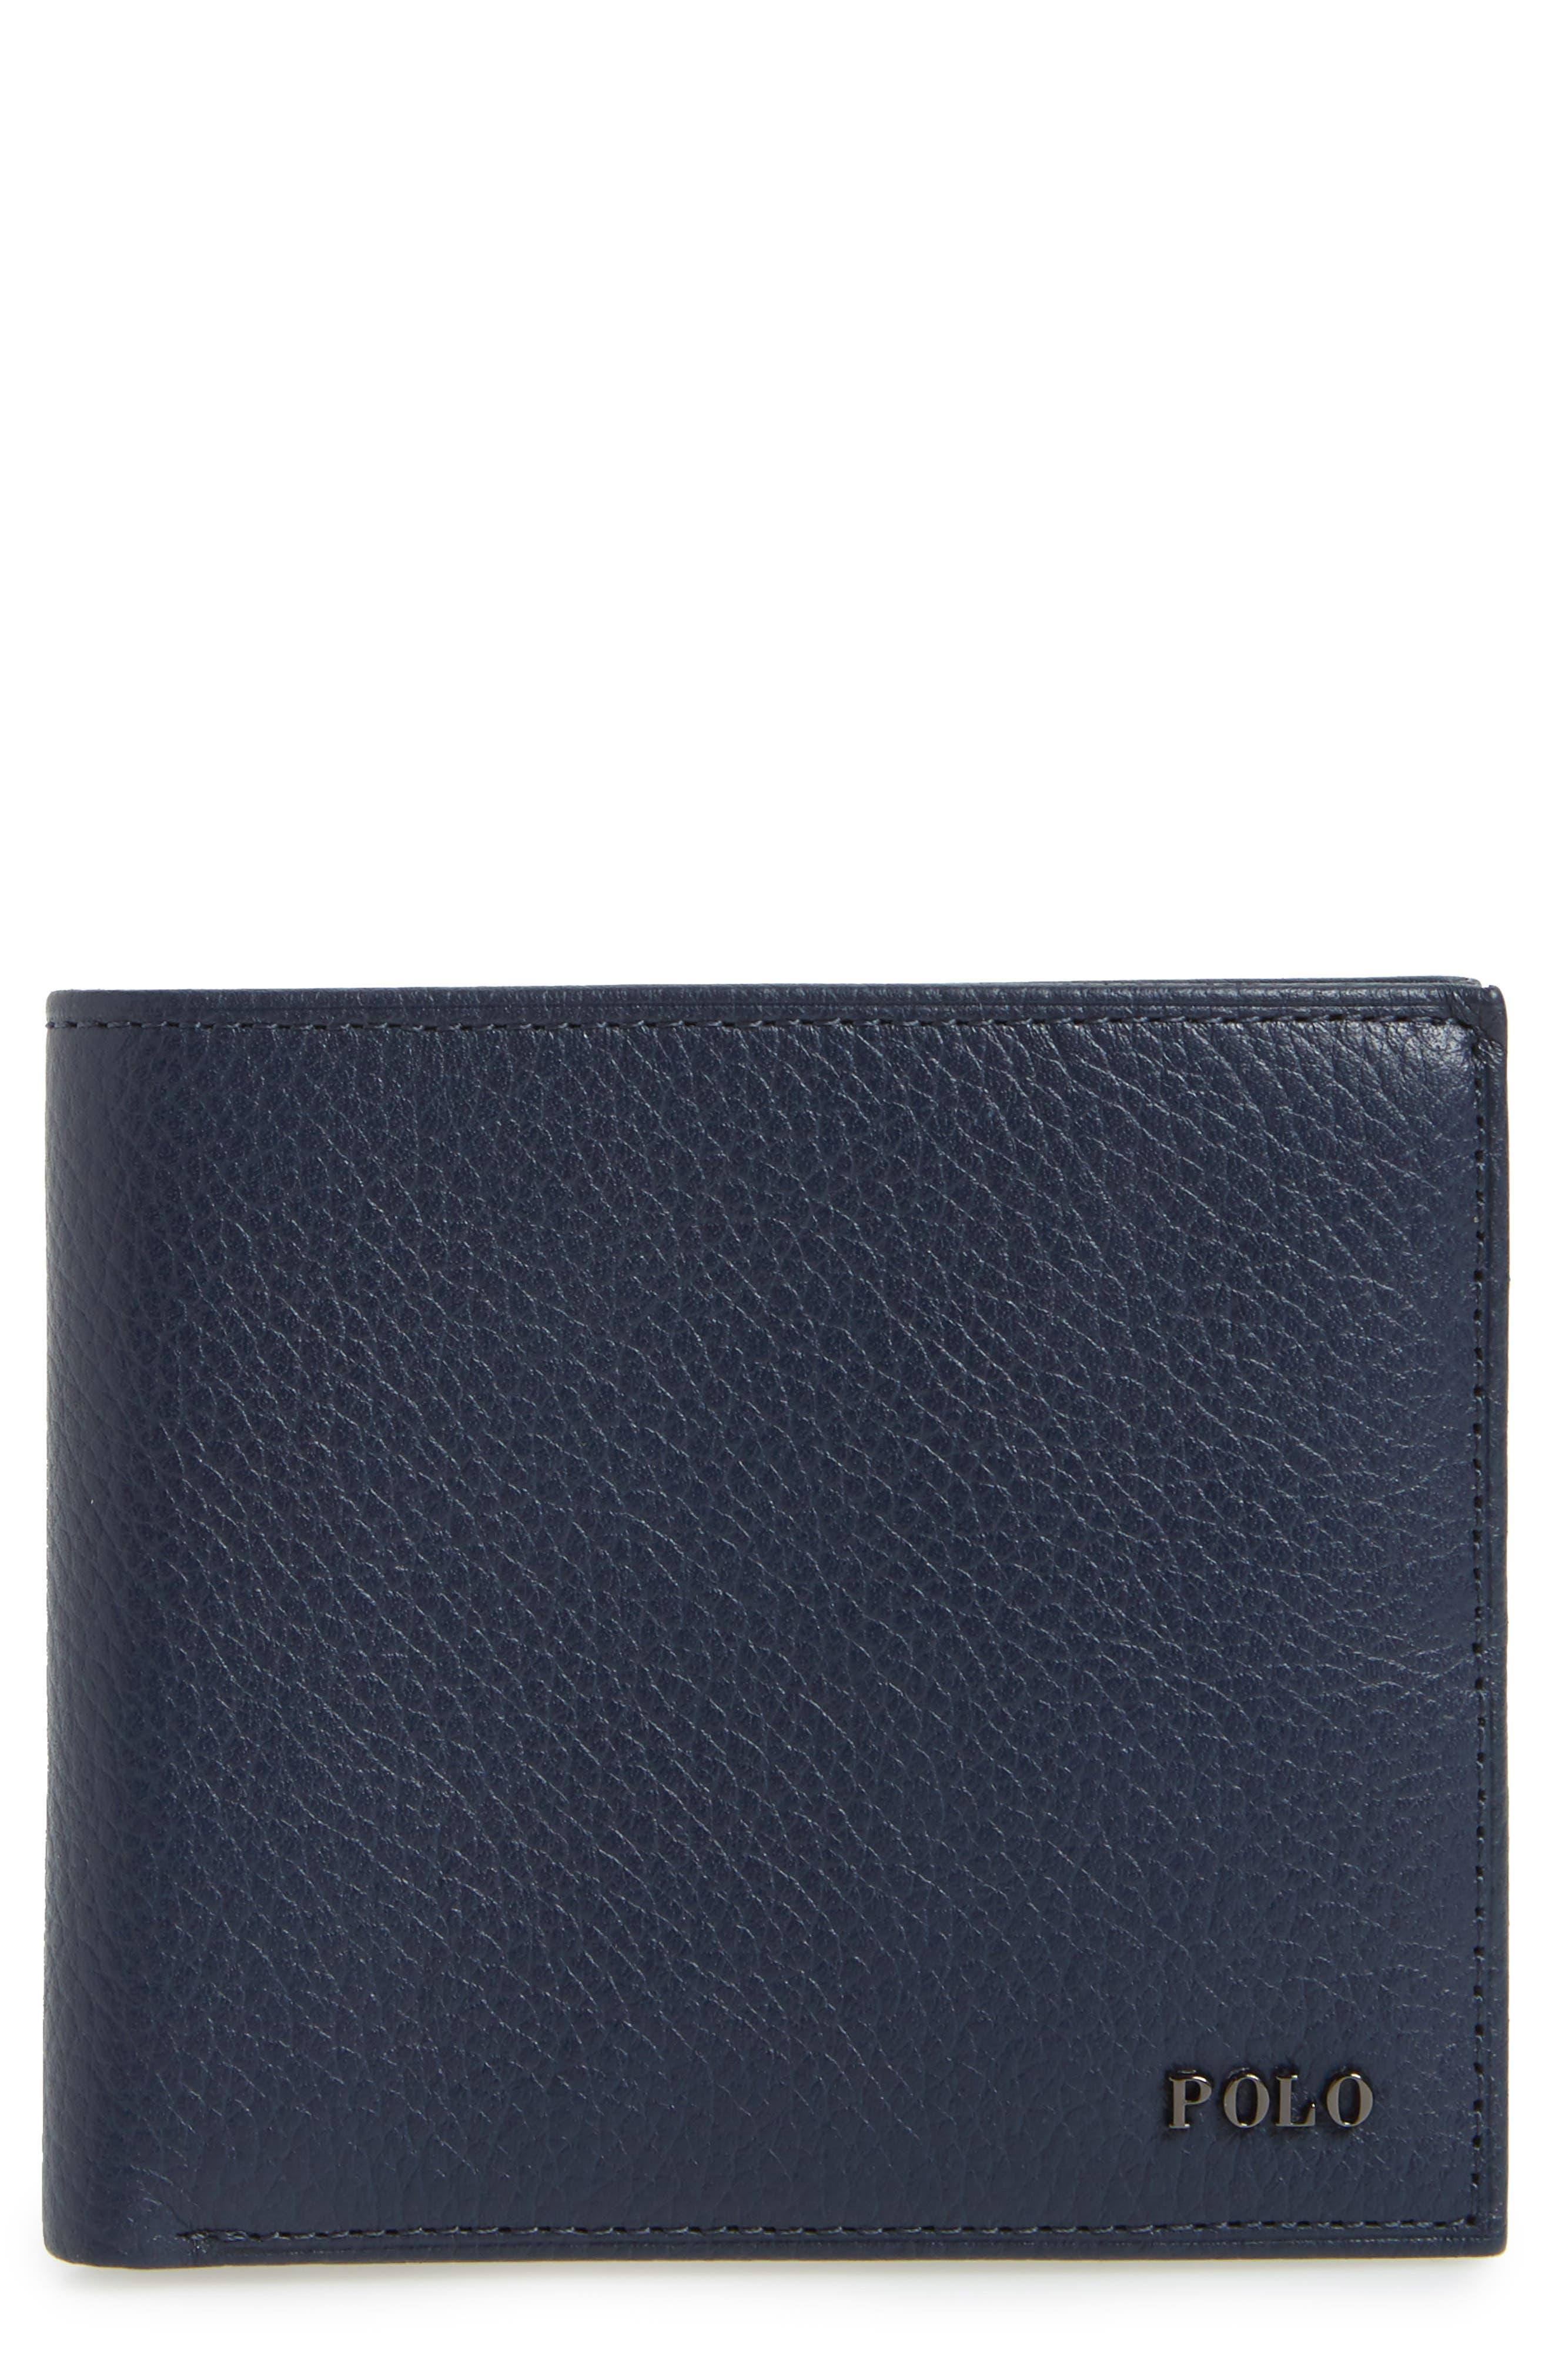 Leather Wallet,                             Main thumbnail 1, color,                             Blue